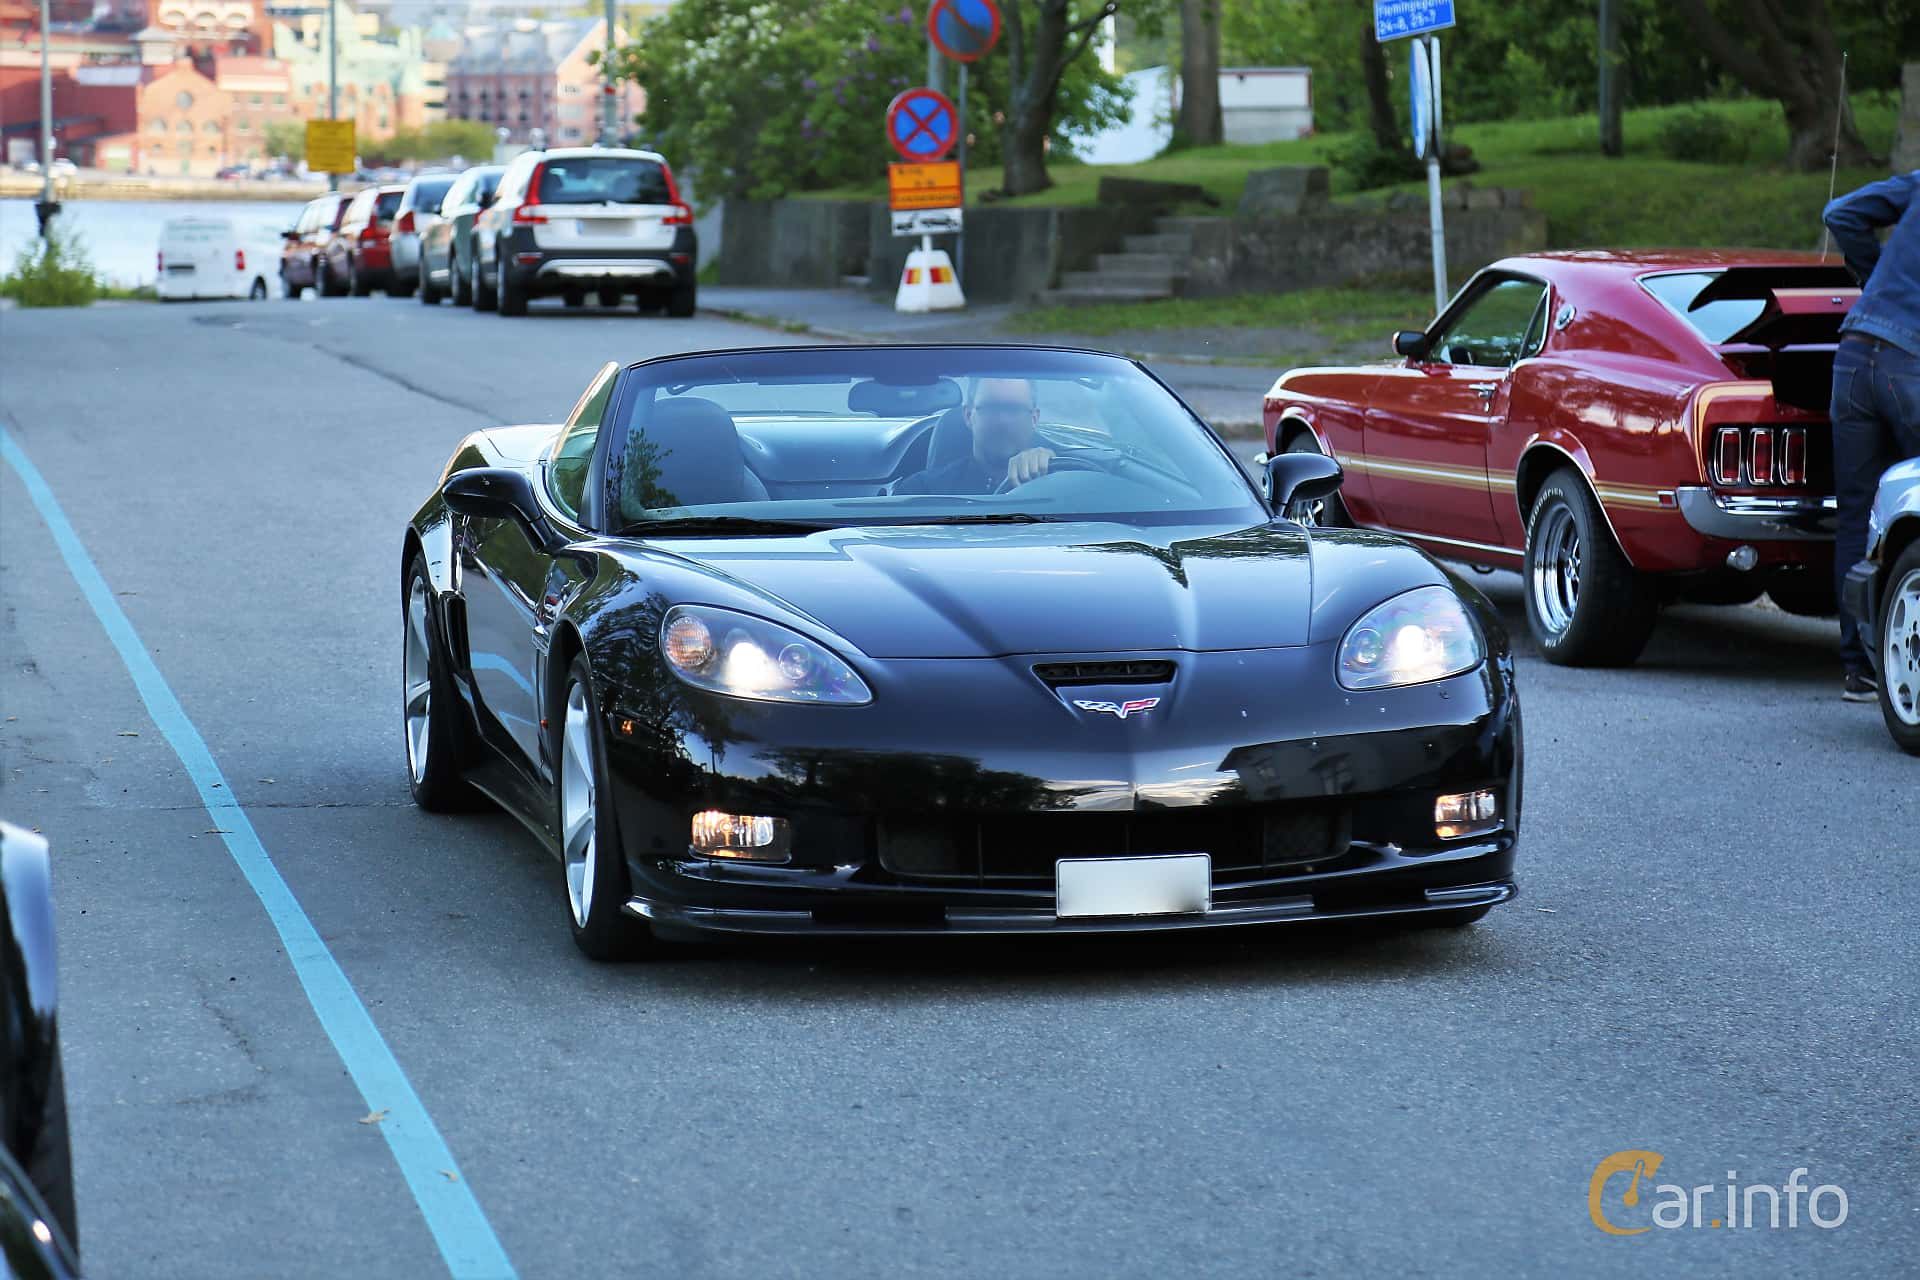 Chevrolet Corvette Grand Sport Convertible 6.2 V8 Automatic, 442hp, 2010